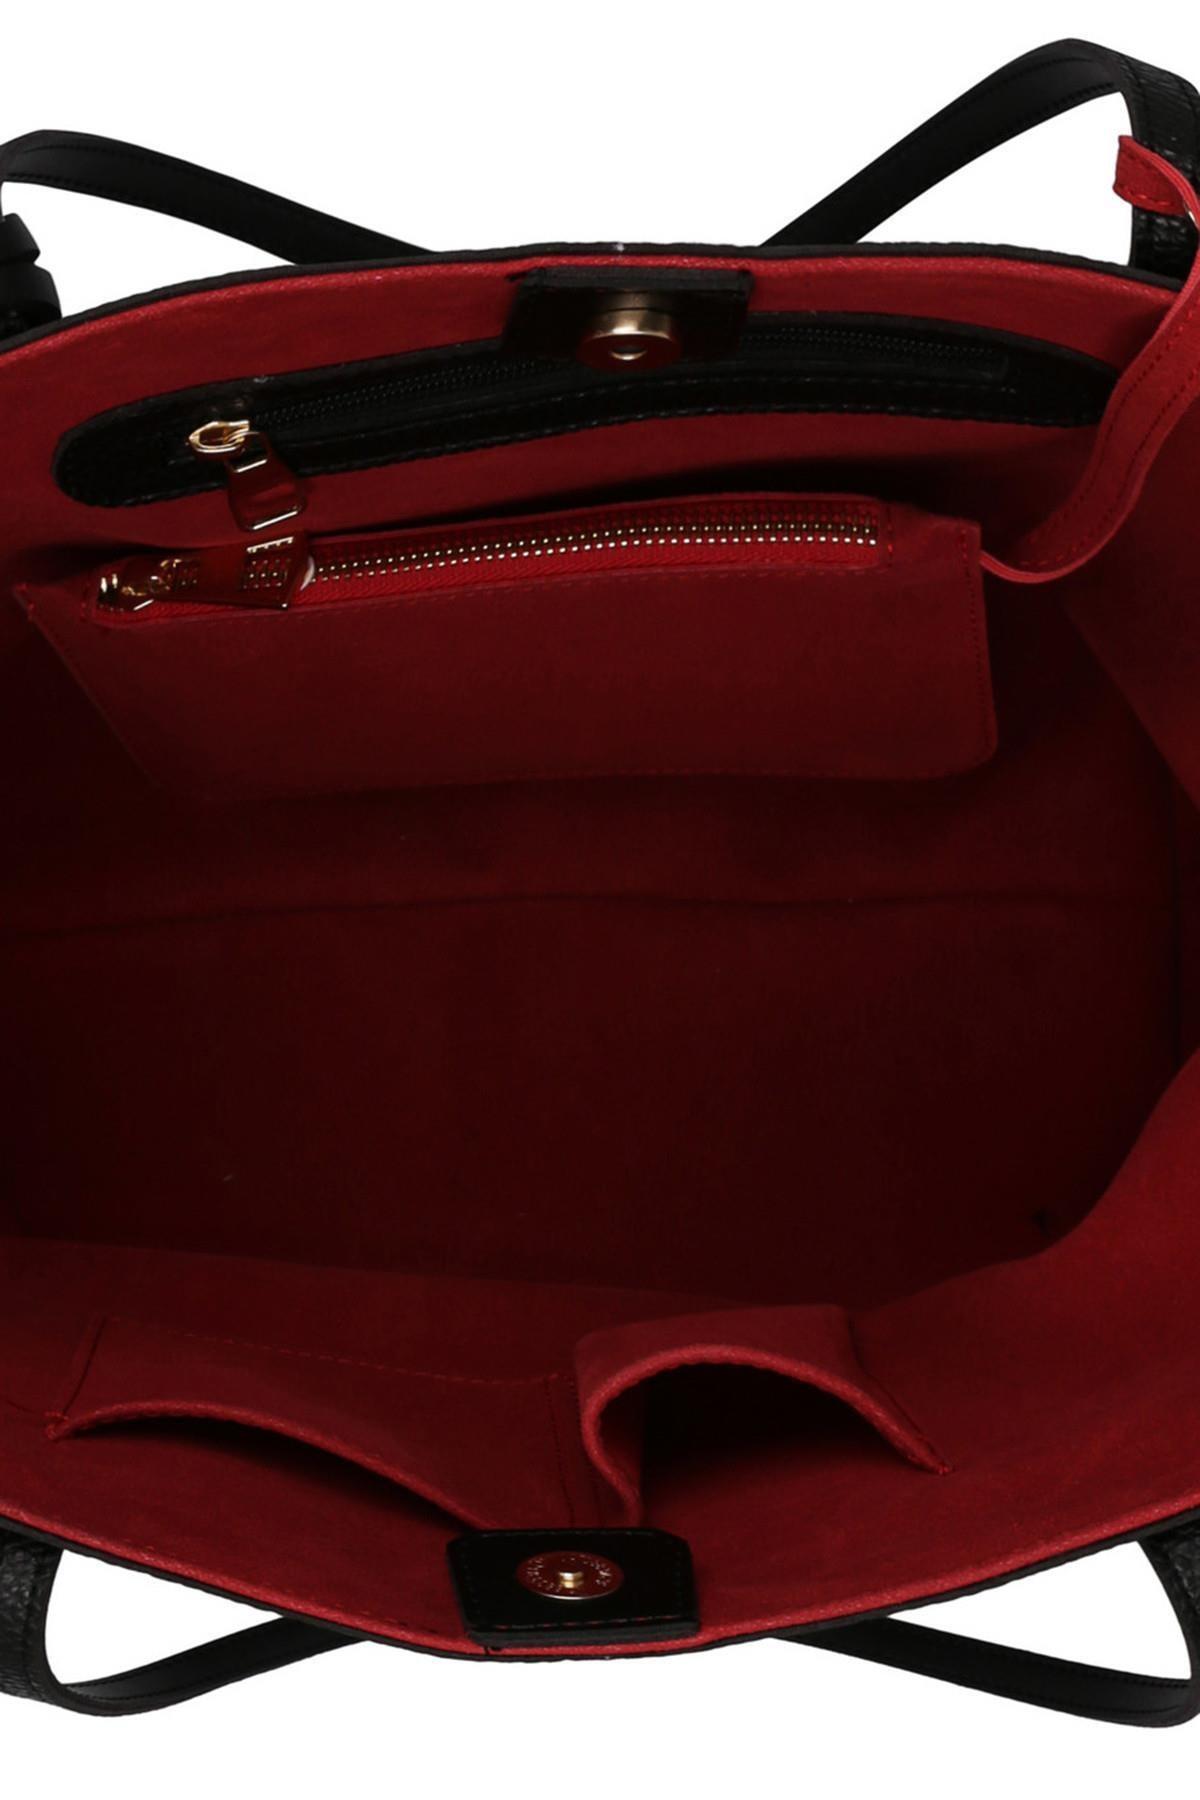 Beverly Hills Polo Club Kadın Tote Çanta Siyah, Kırmızı 4